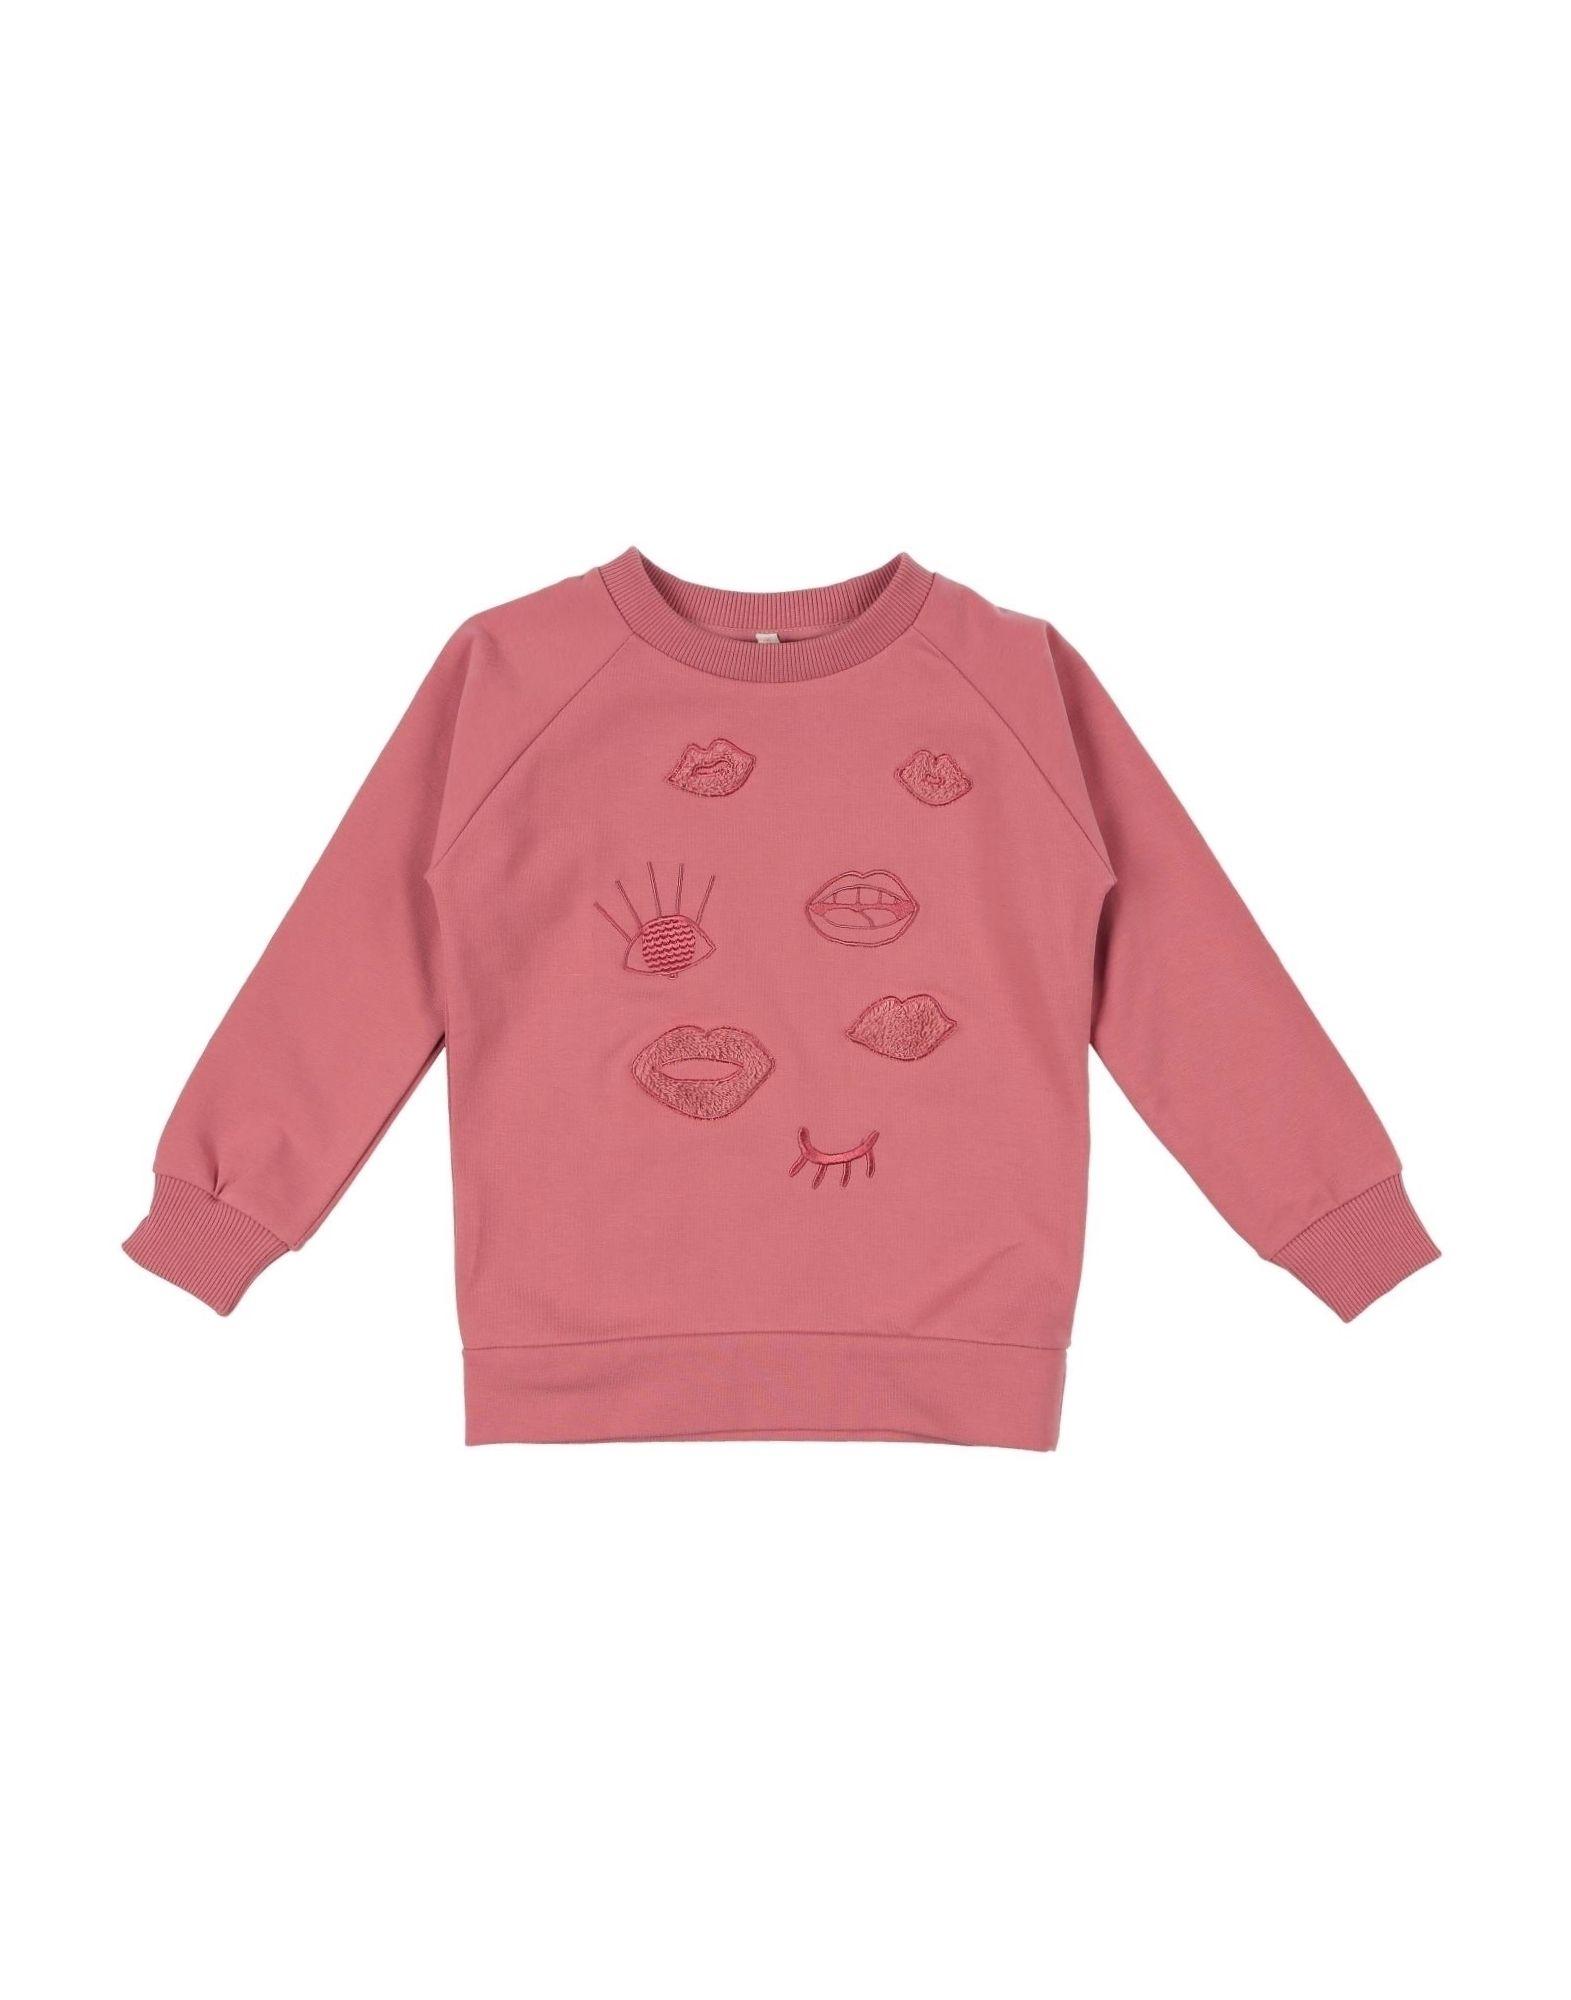 Iglo+indi Kids' Sweatshirts In Pink